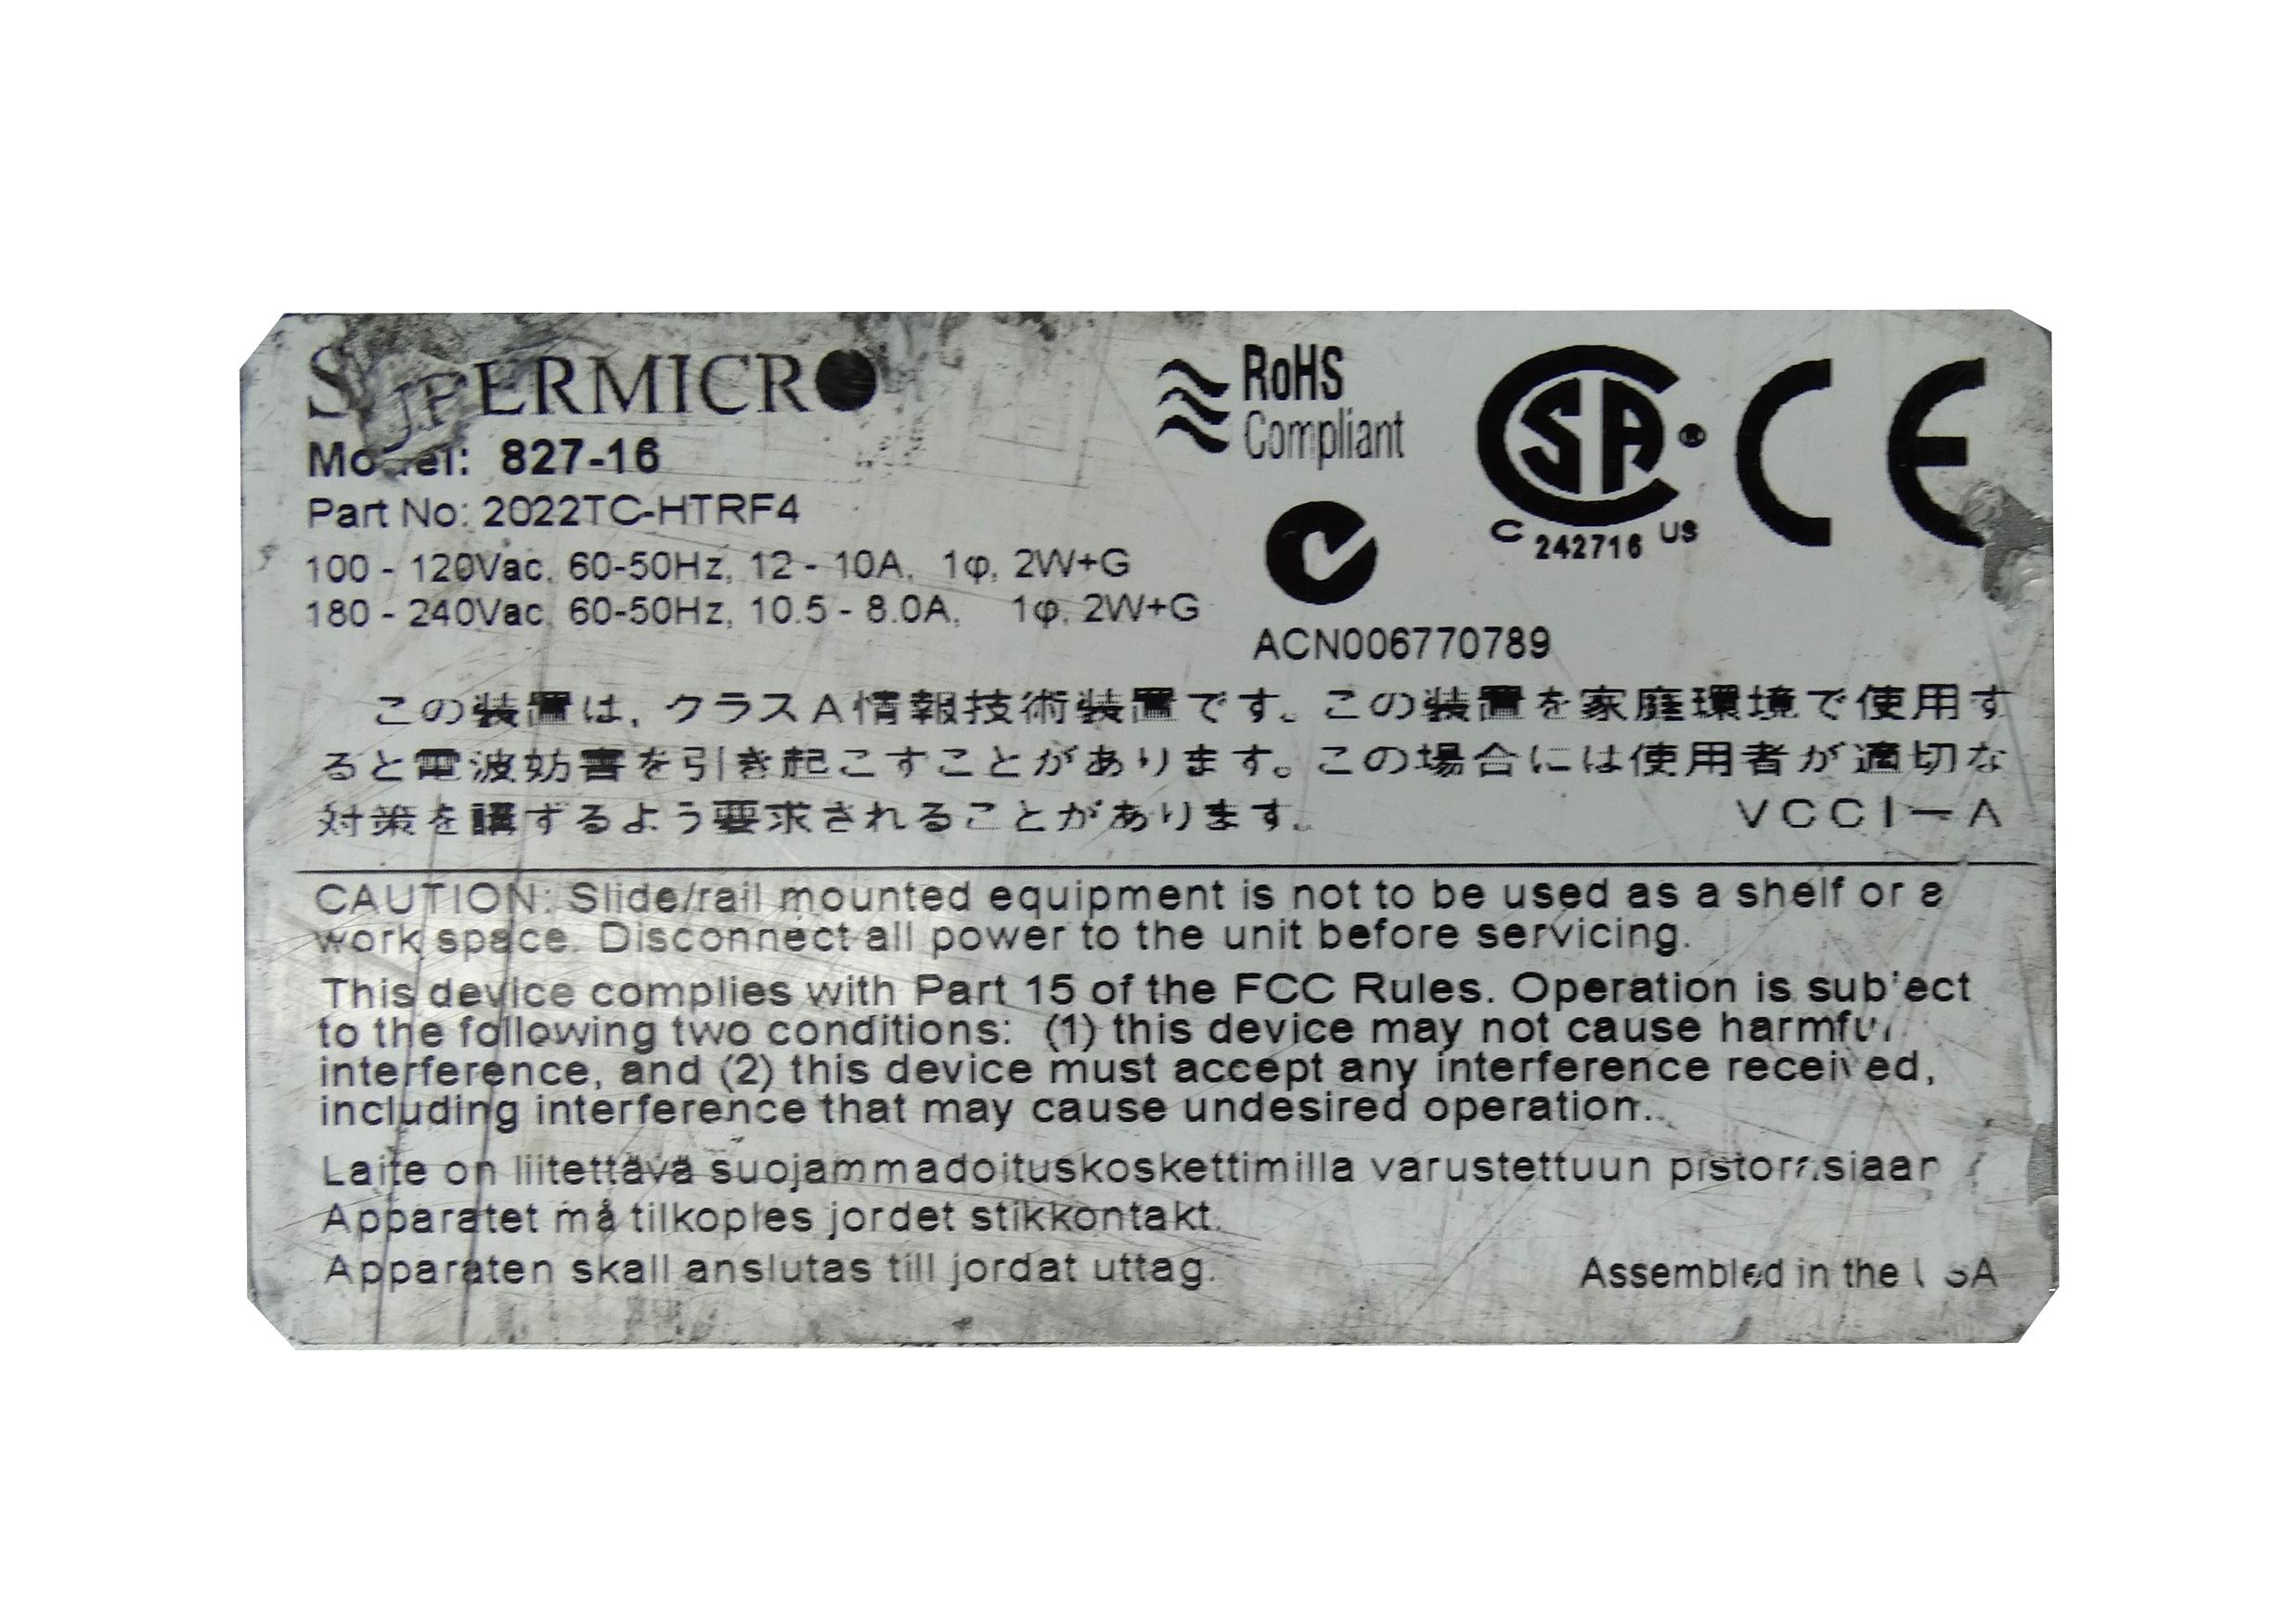 Supermicro-2U-2022TC-HTRF4-4-Node-Barebone-AMD-Server thumbnail 2